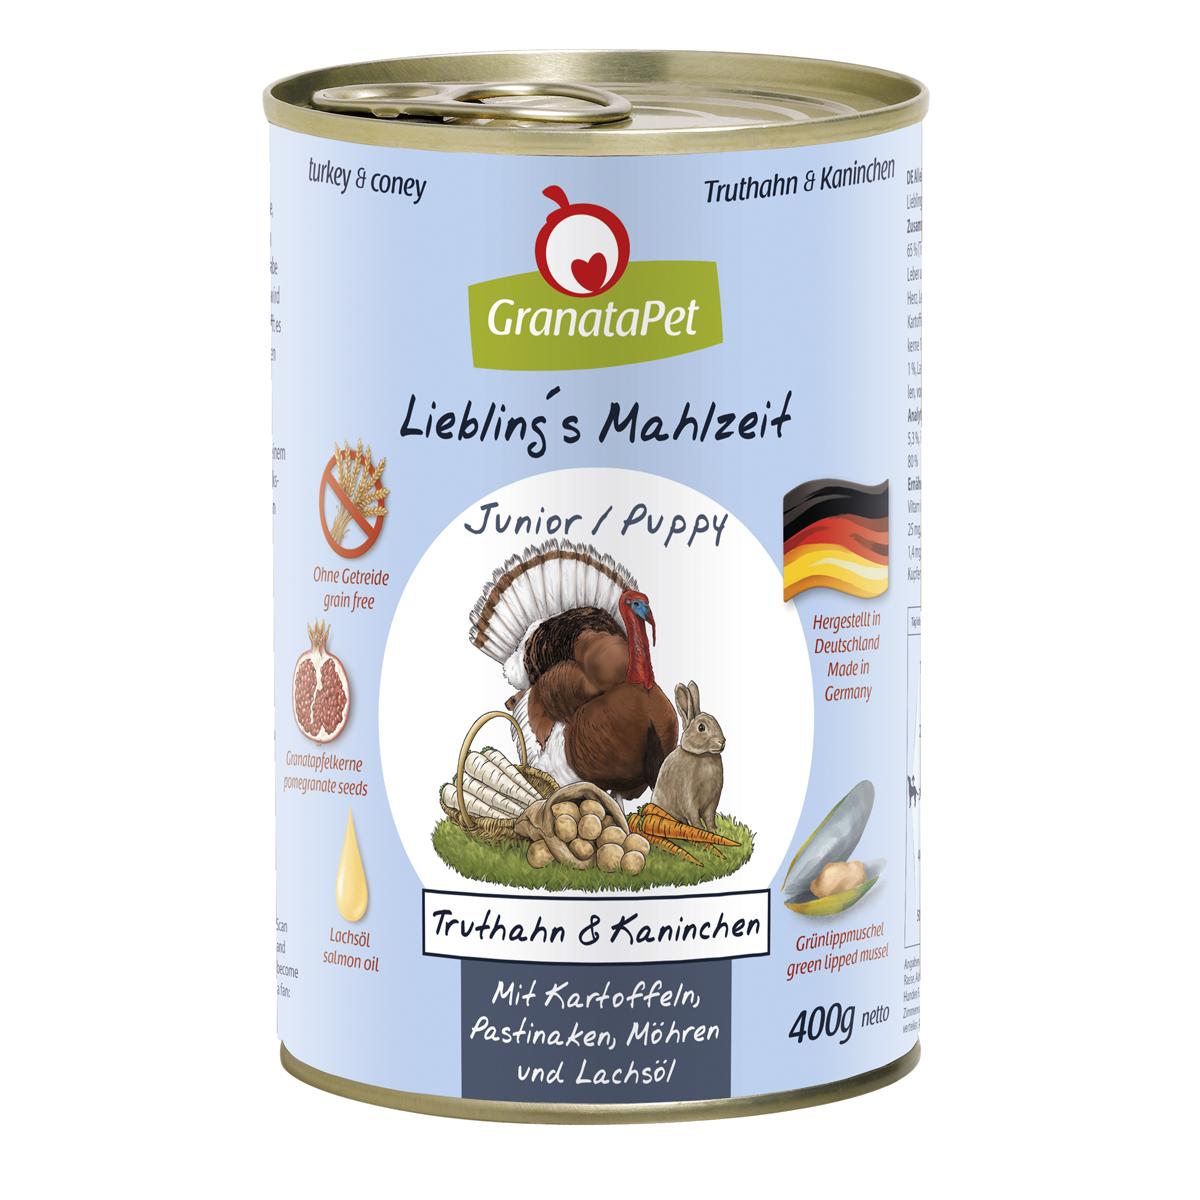 lieblings-mahlzeit-box